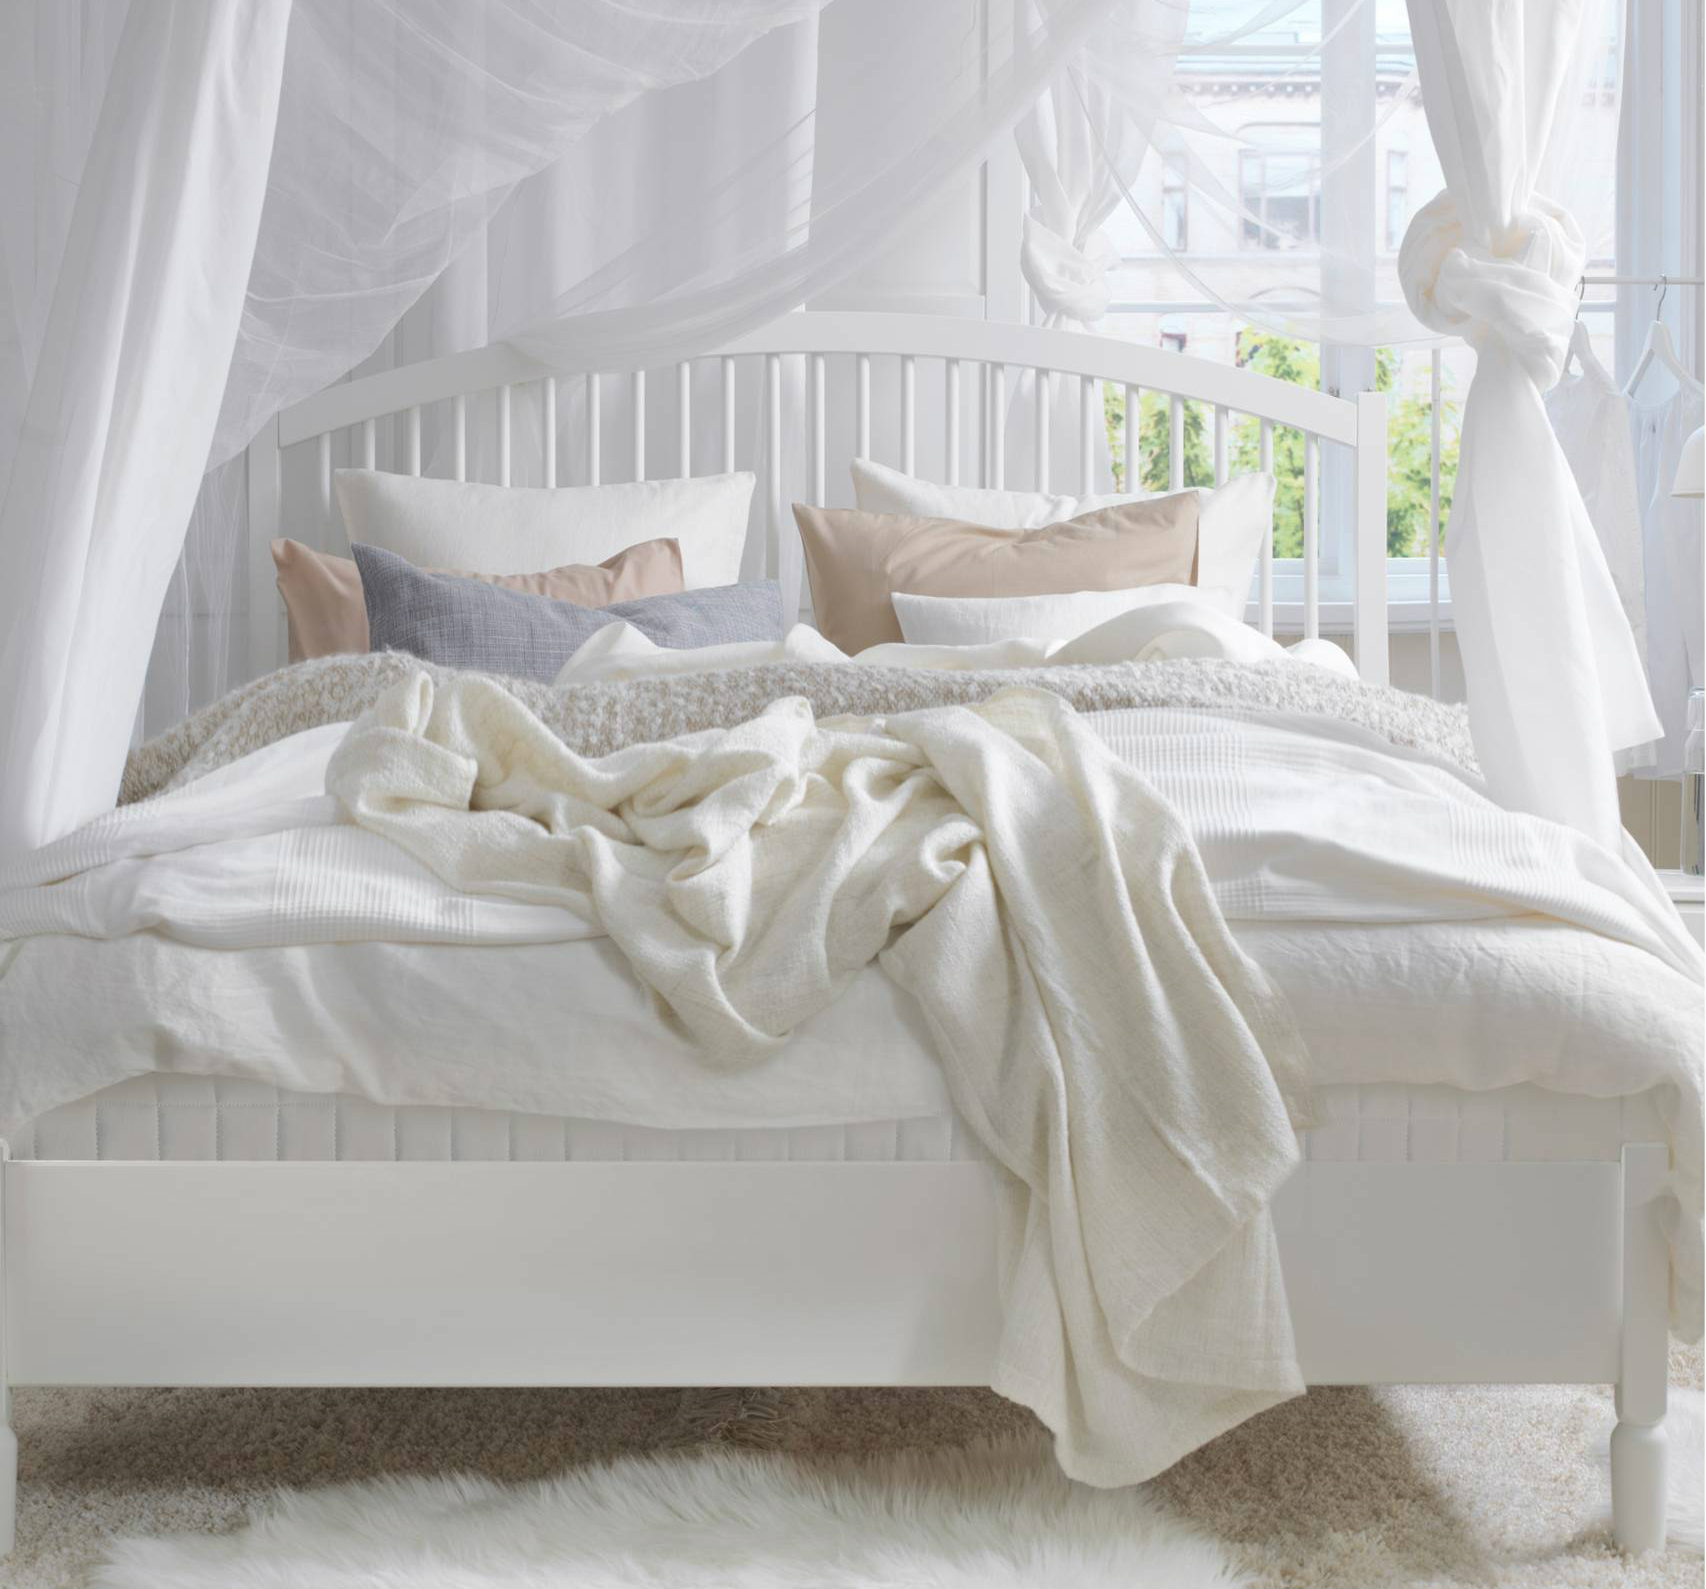 Catlogo Ikea 2018 Novedades Para Dormitorios Modern Home Revolution